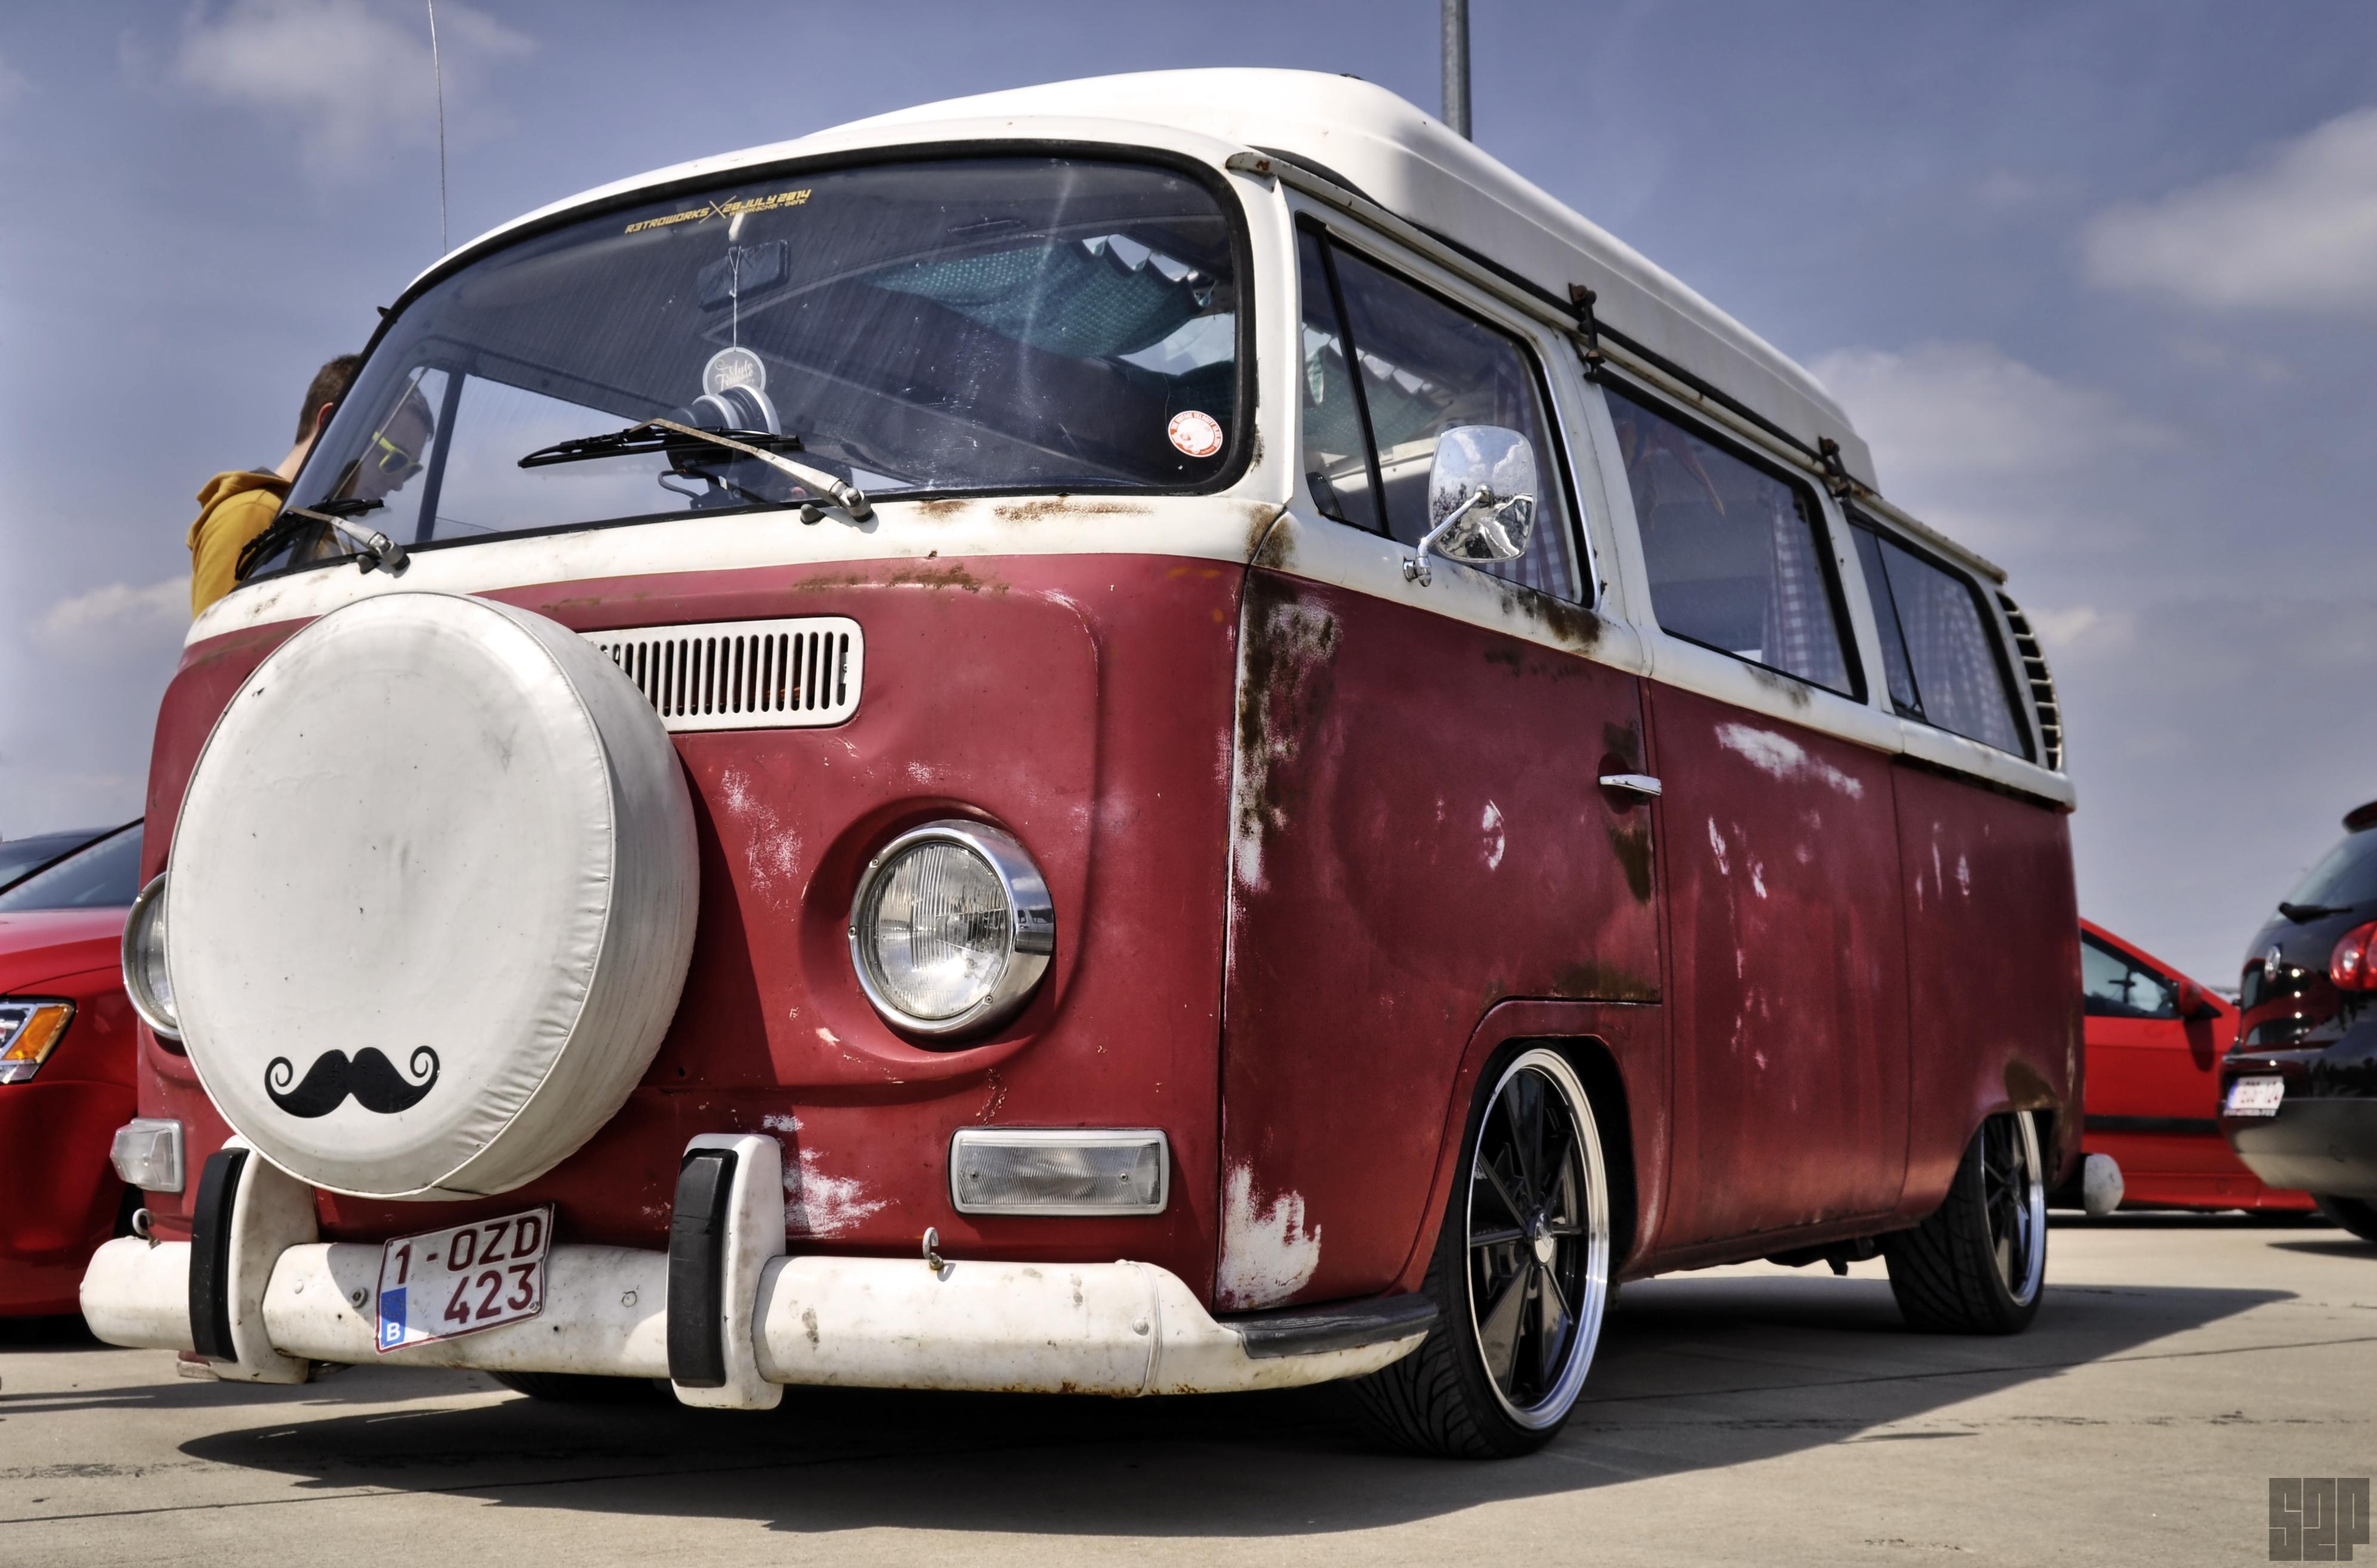 1000 images about kombosas on pinterest vw bus for Interieur combi vw